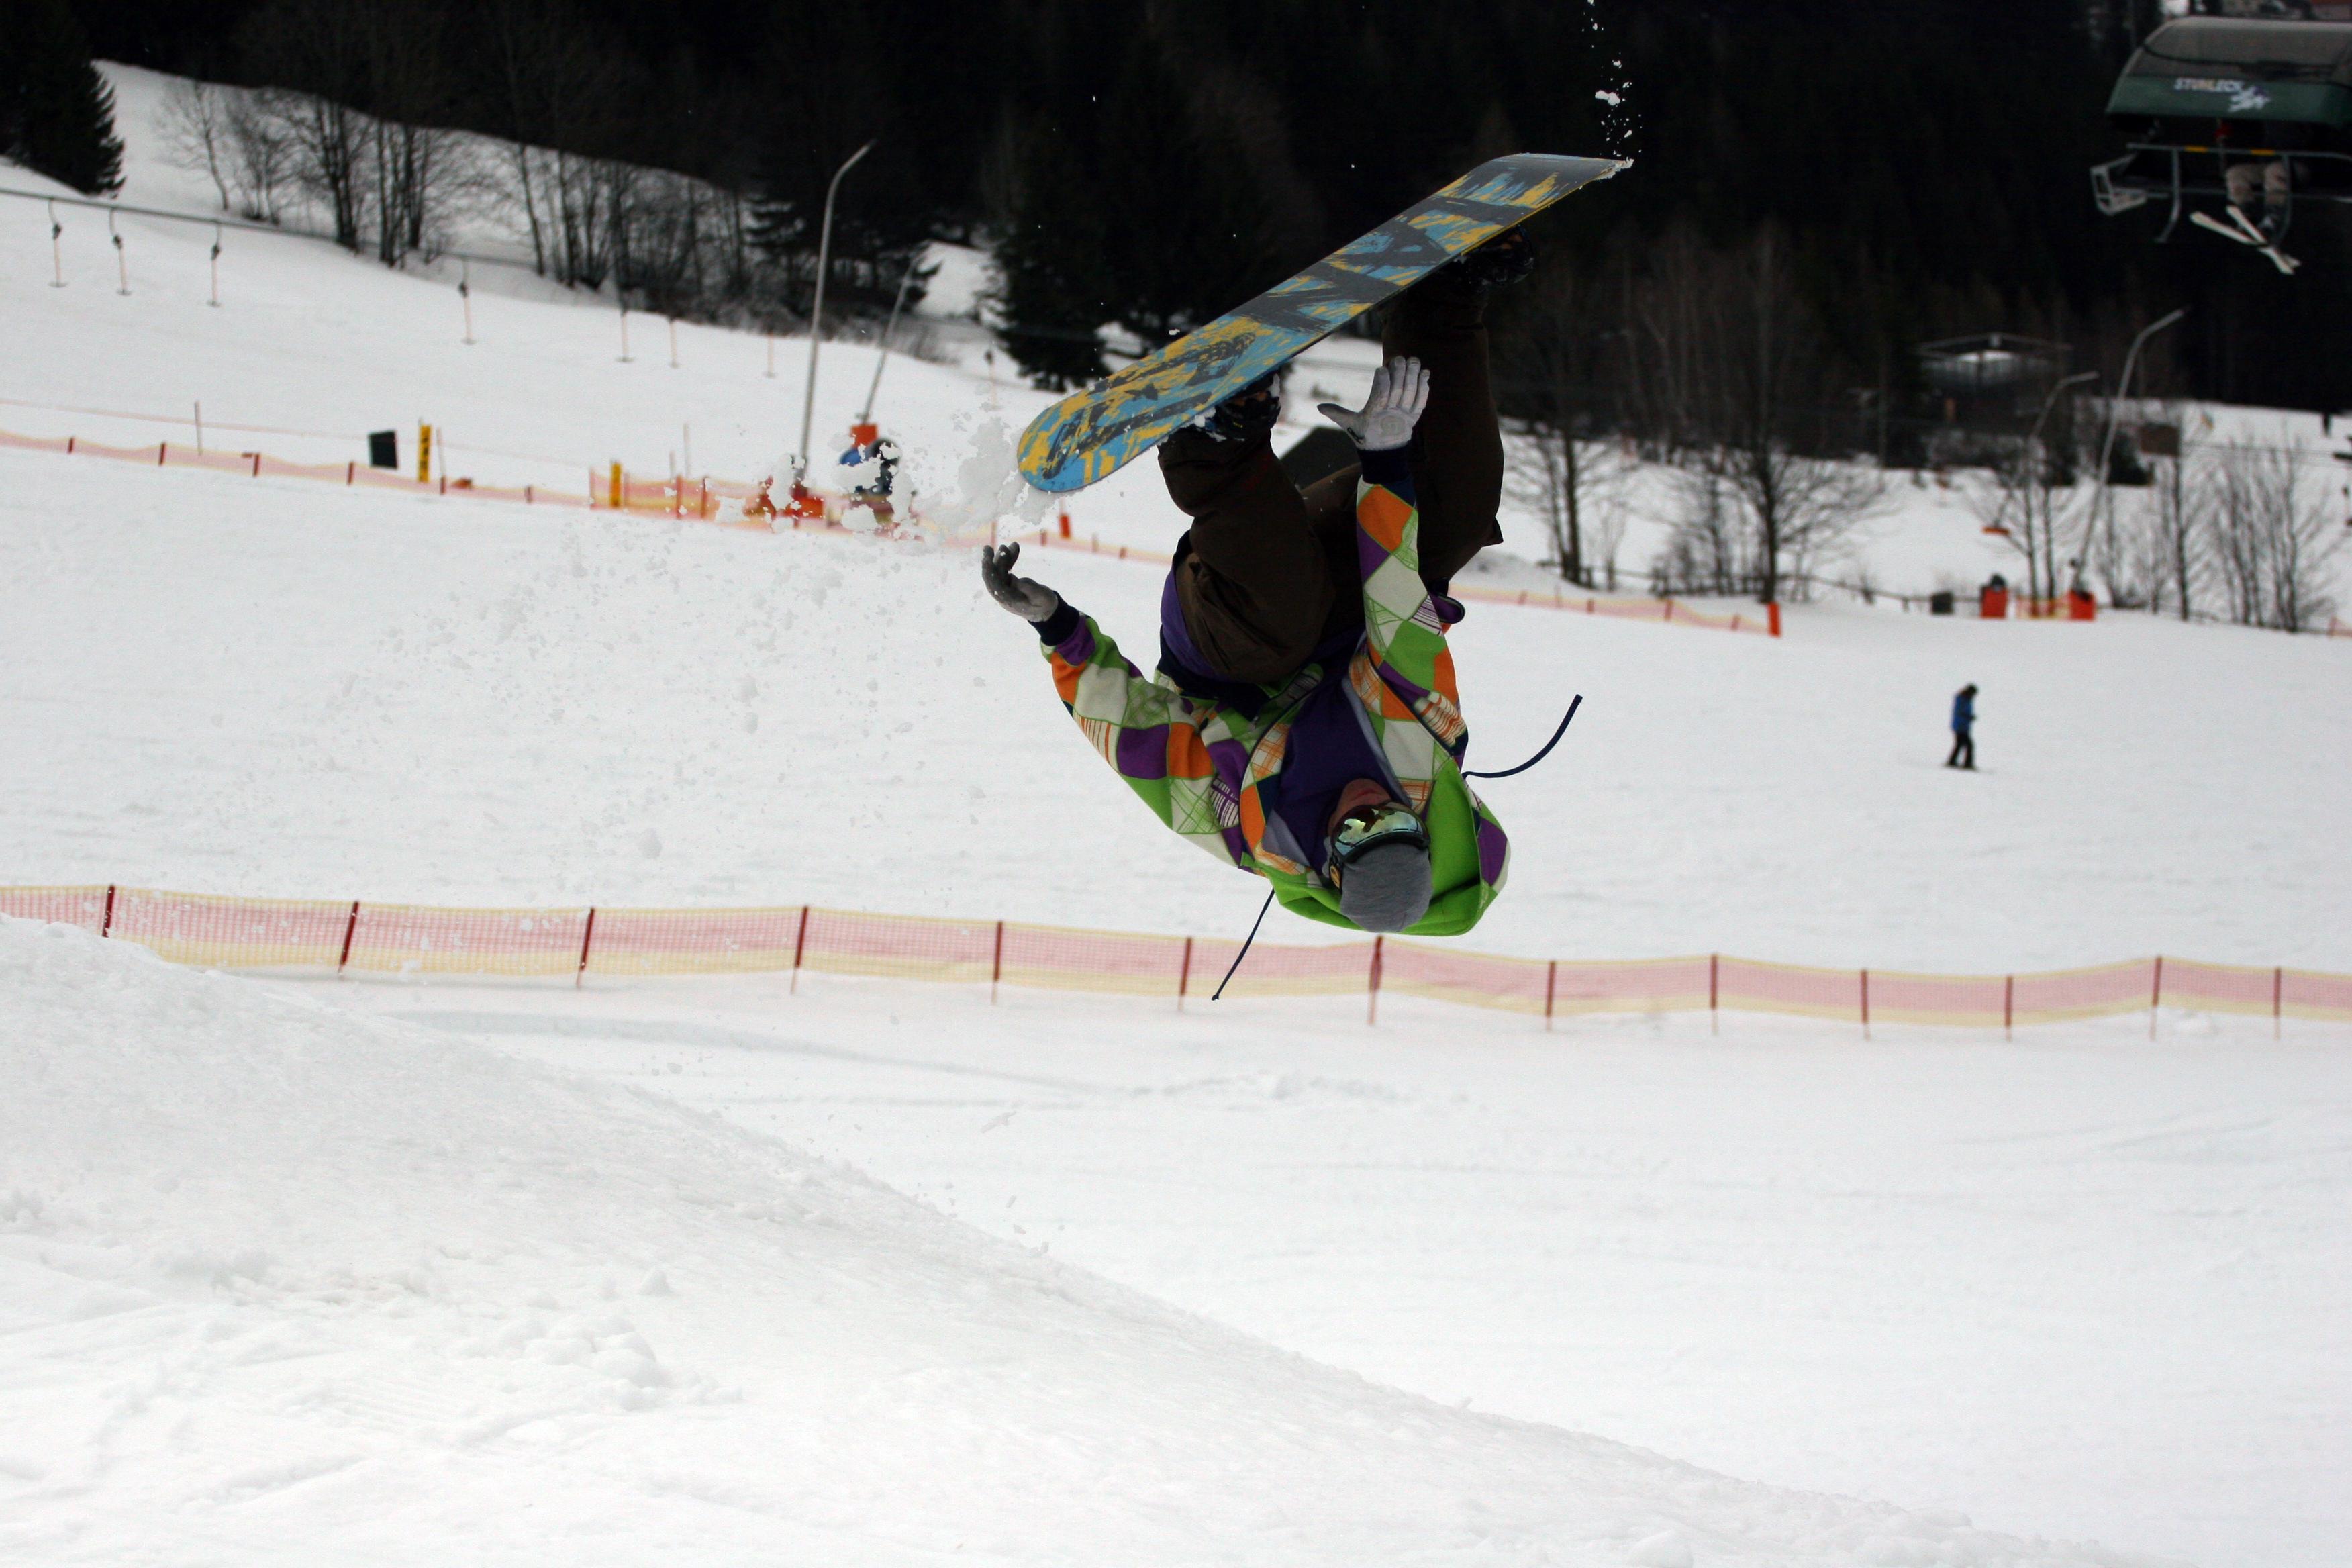 Snowboard frontflip #1